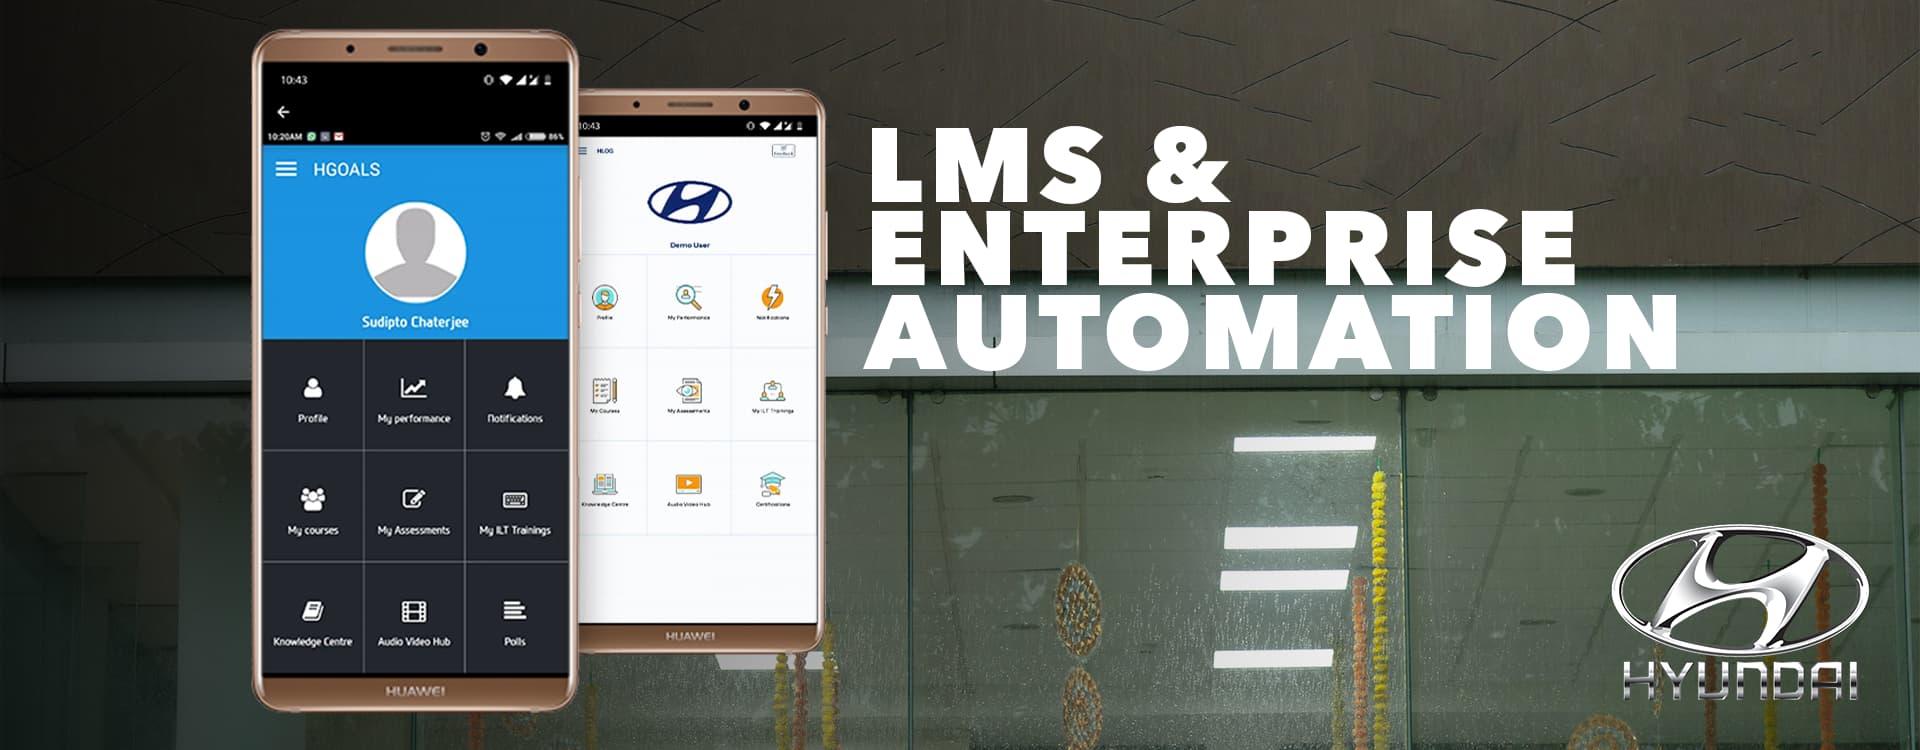 LMS mobile application development company